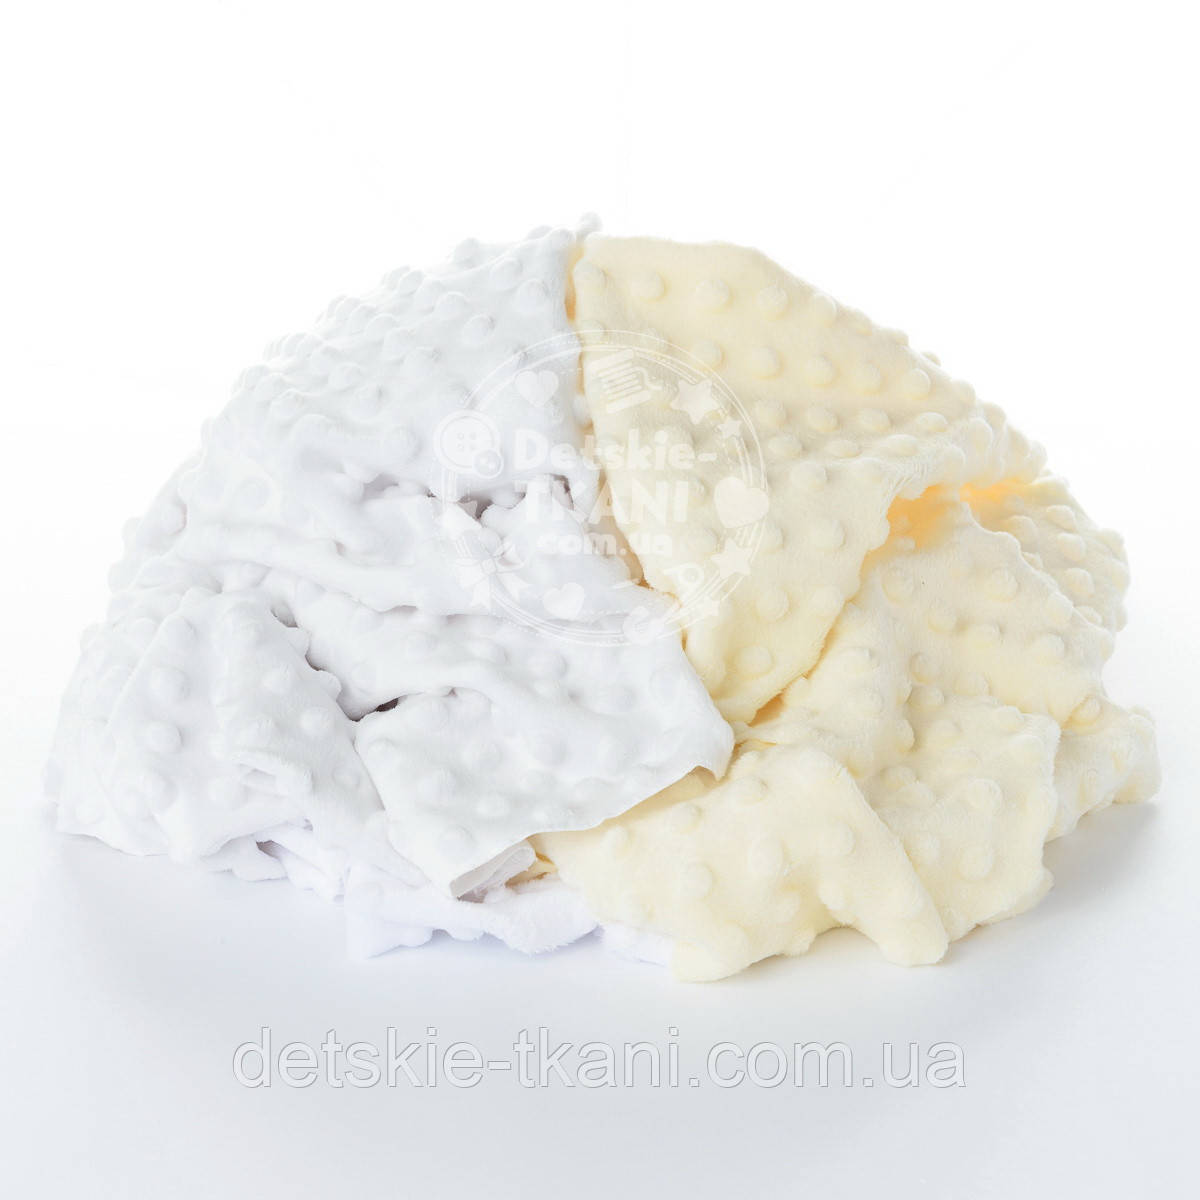 Плюш Minky лоскуты для рукоделия бело-молочного цвета, 0.5 кг